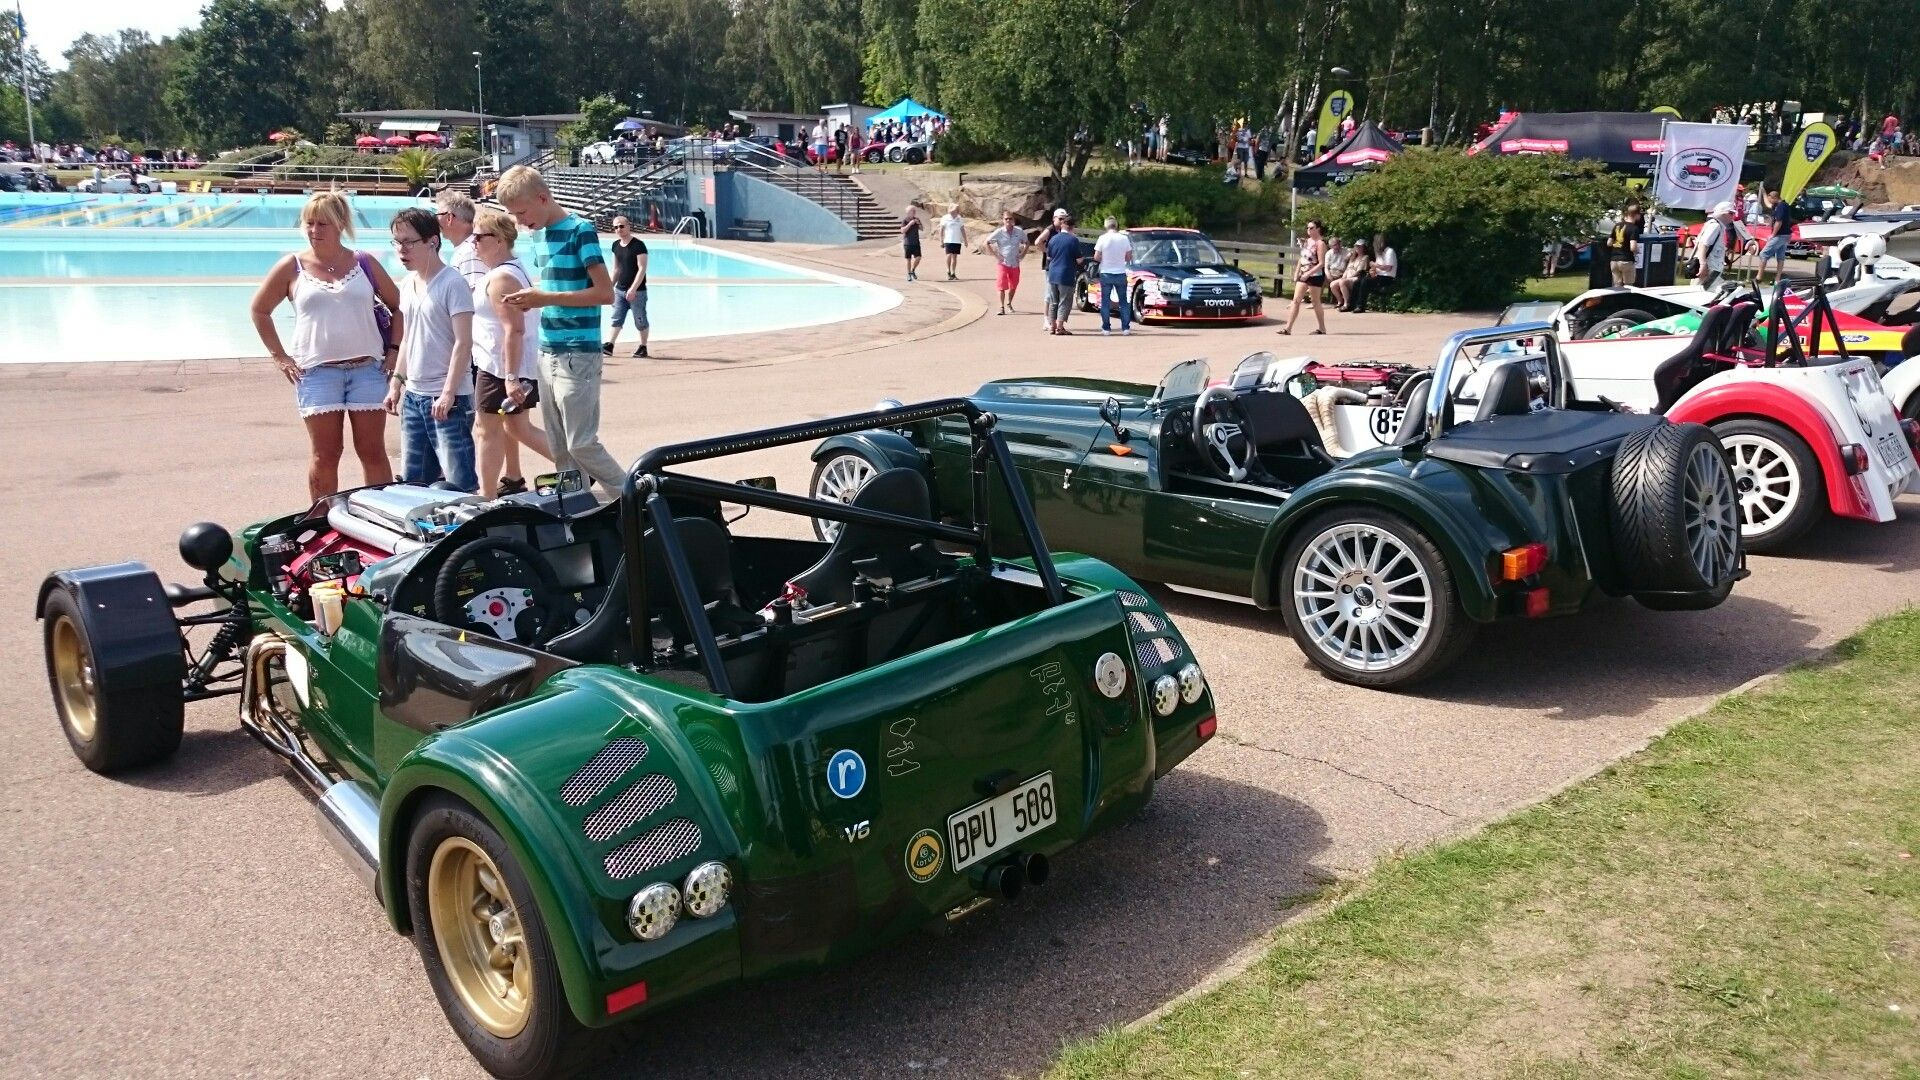 Lotus Super 7 replicas. Halmstad, Sweden, Sports Car Event